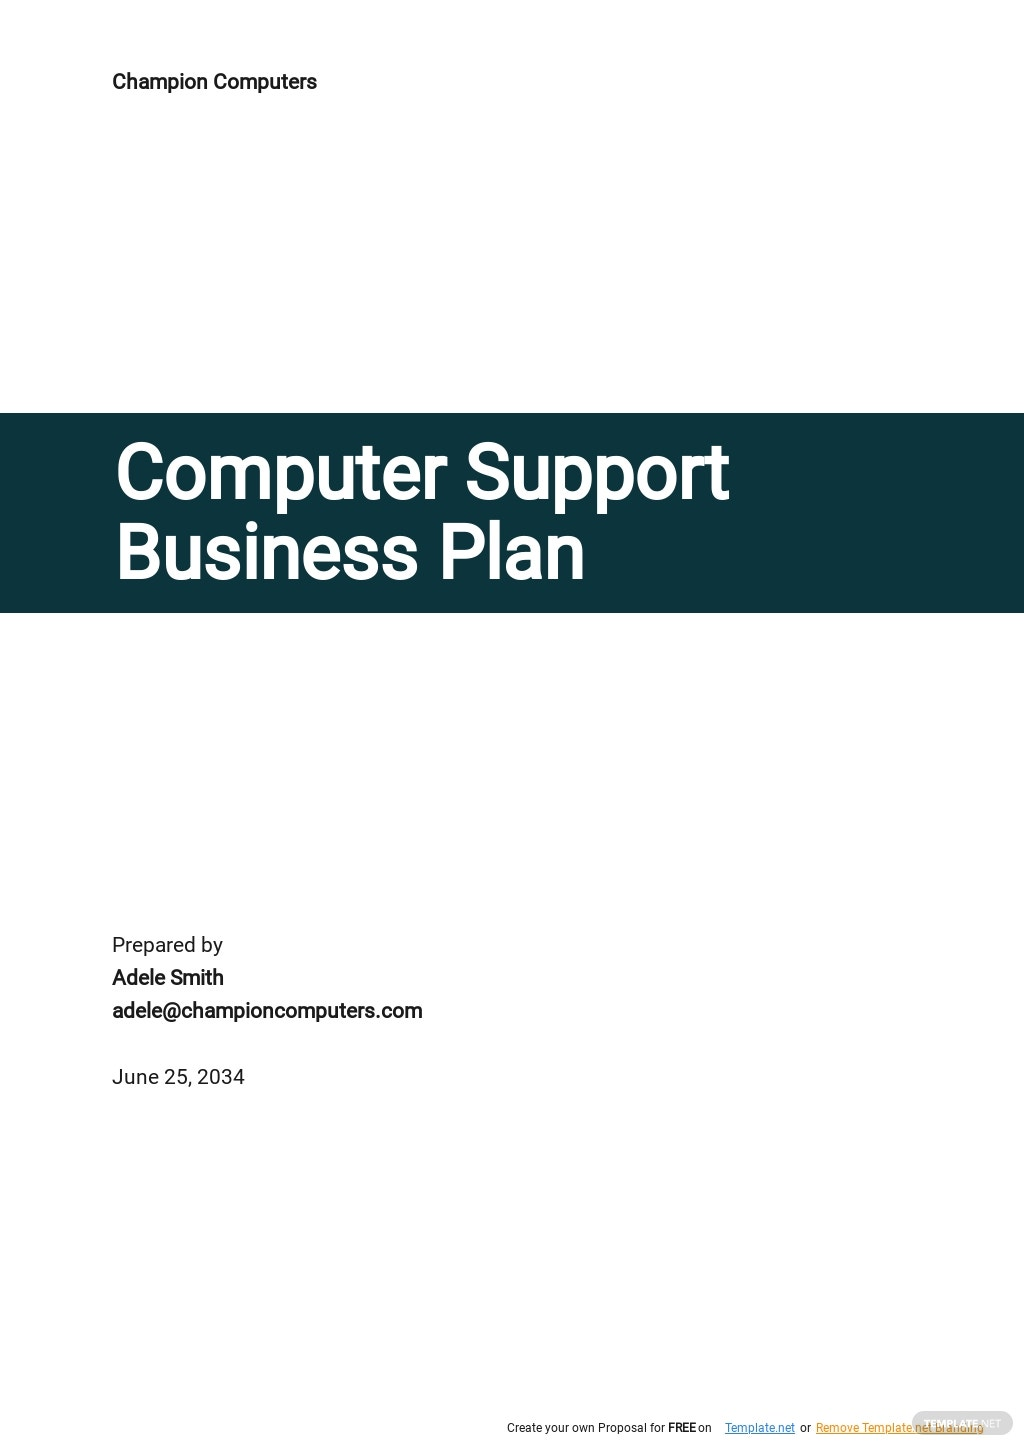 Computer Support Business Plan Template.jpe